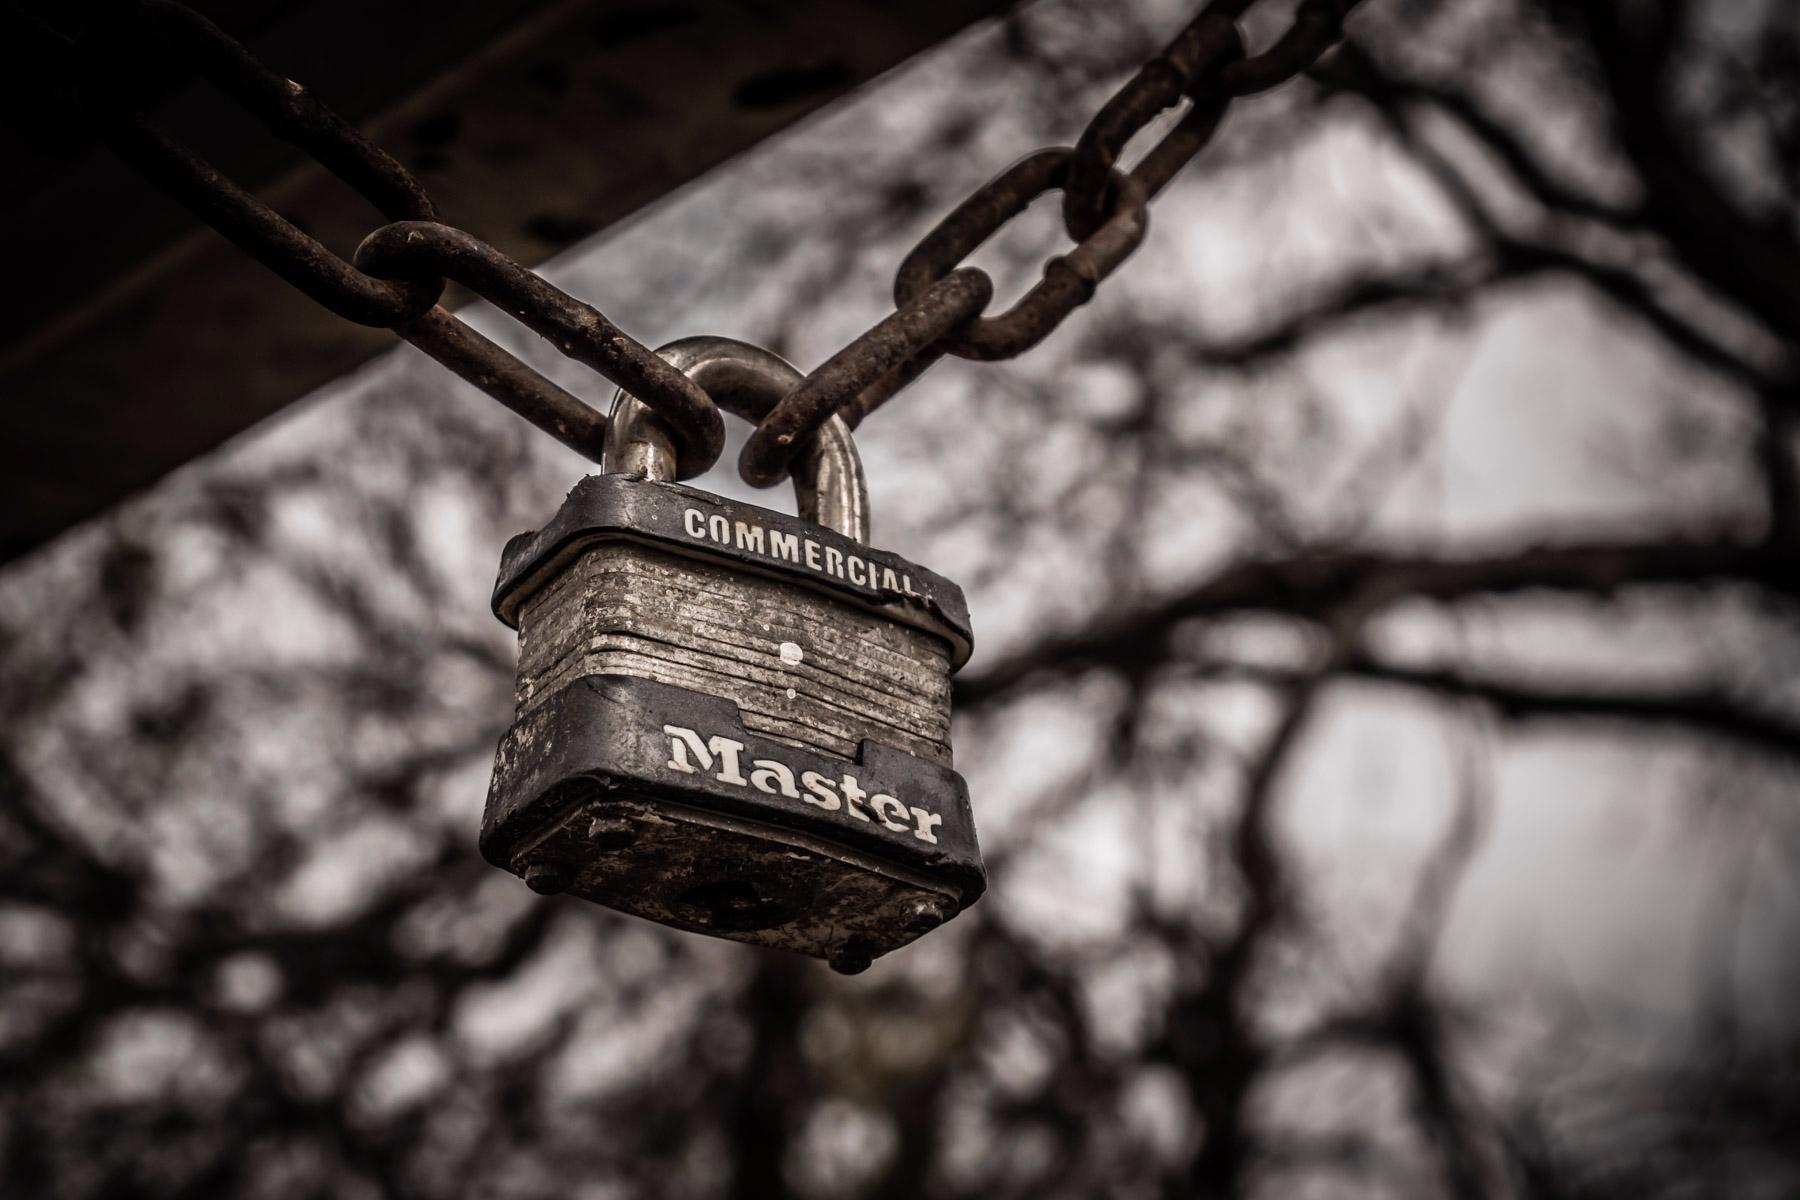 Locked padlock hangs chain Rich - mattgharvey | ello